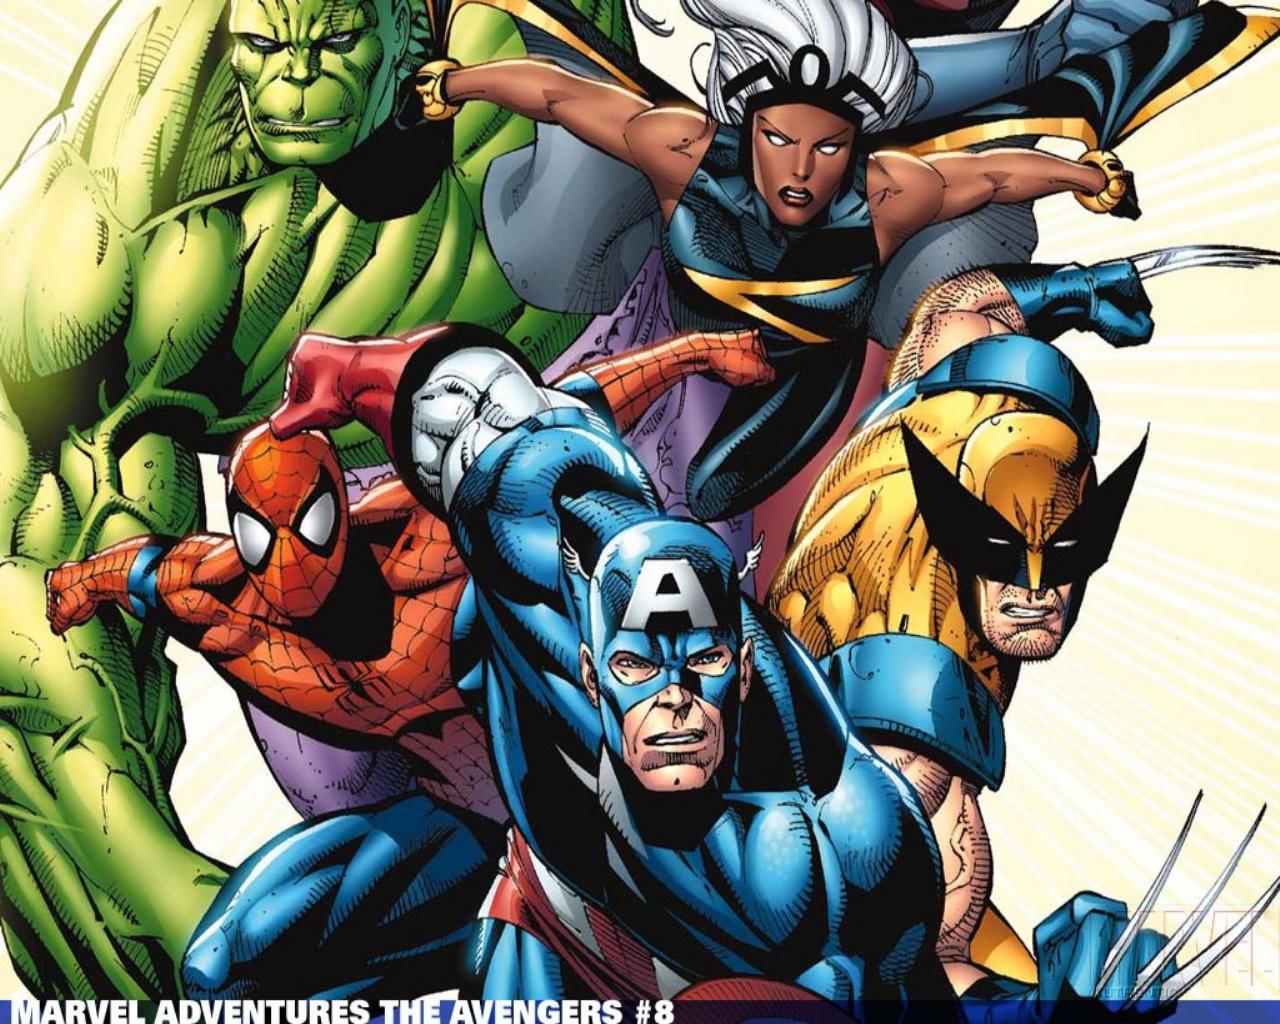 Digital HD Wallpapers Marvel Avengers Movie HD Wallpapers 1280x1024